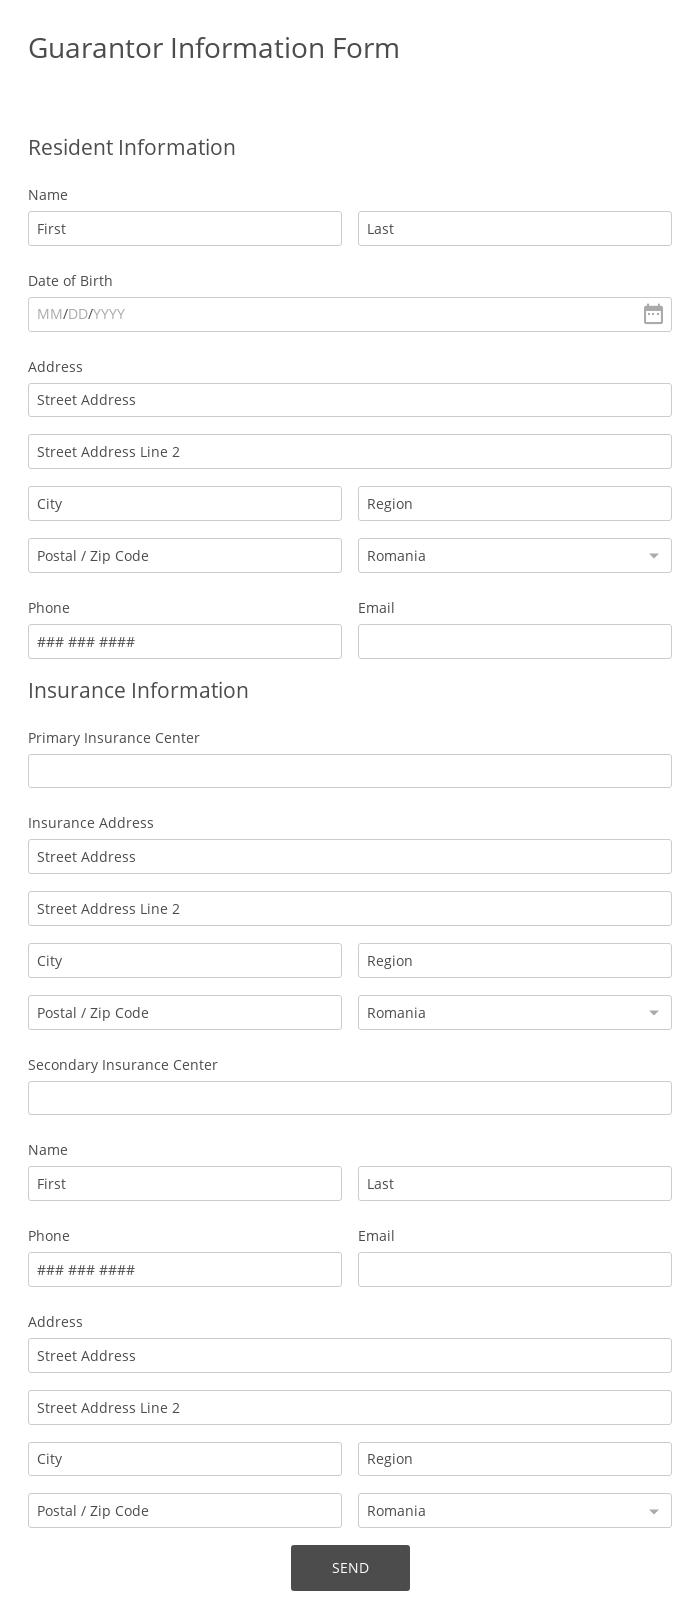 Guarantor Information Form